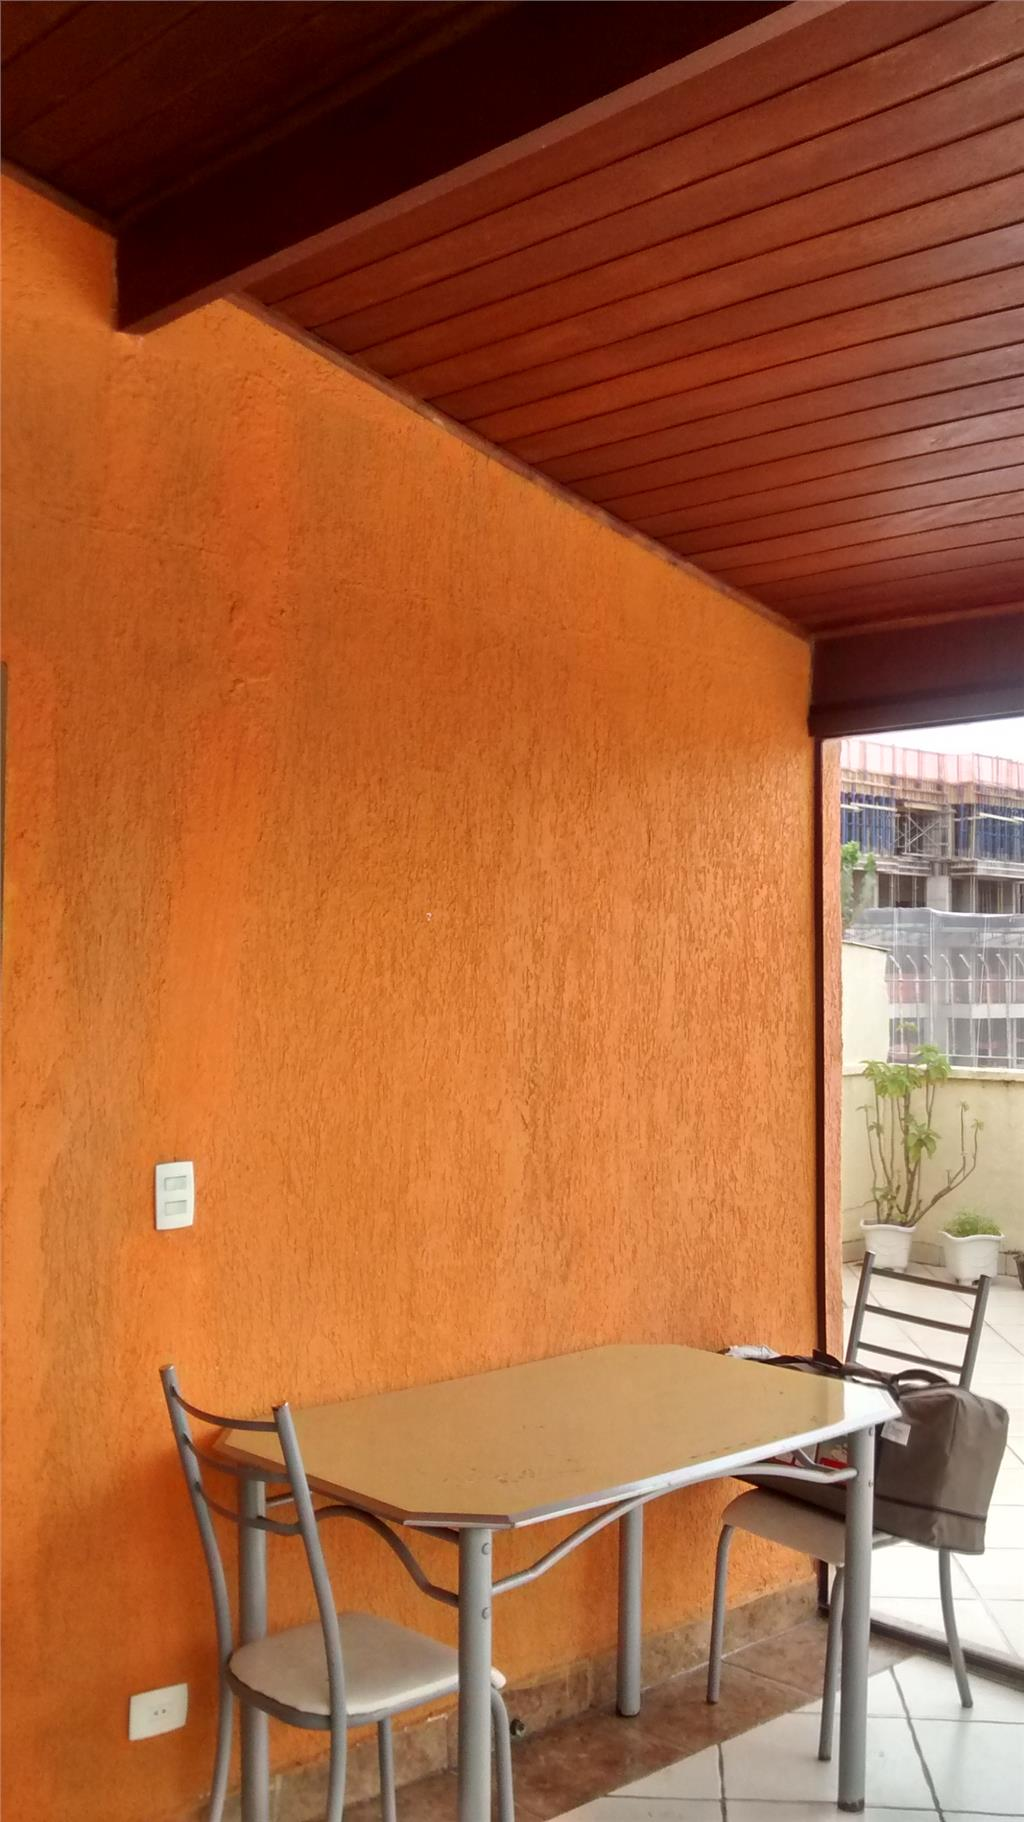 Cobertura 3 Dorm, Vila Gustavo, São Paulo (CO0061) - Foto 18